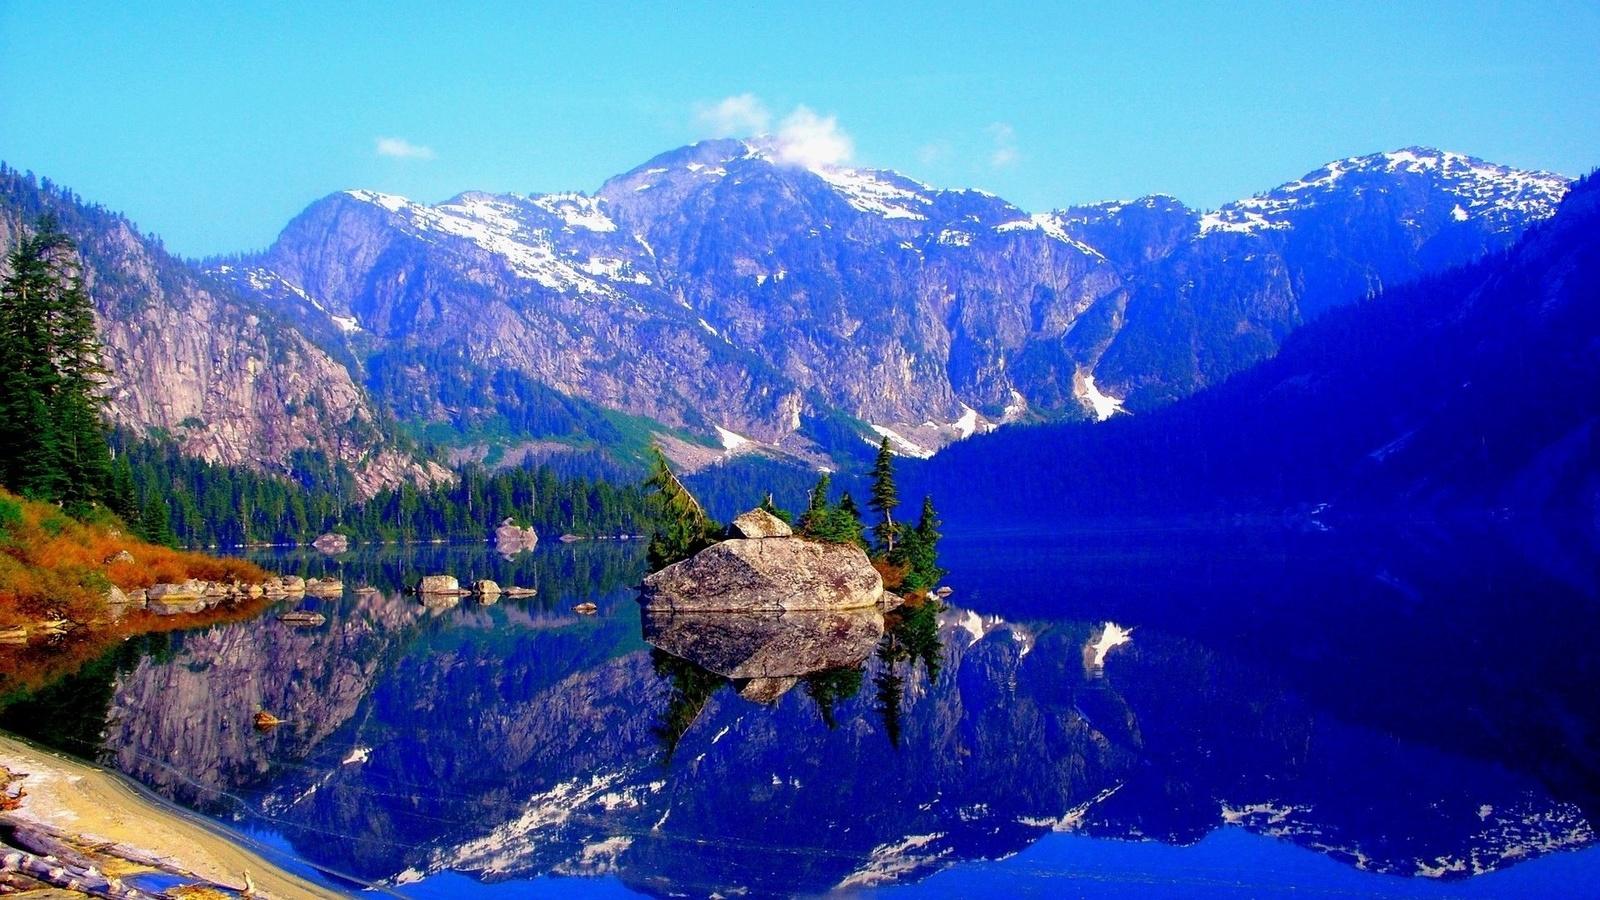 landscape, nature, mountains, lake, island